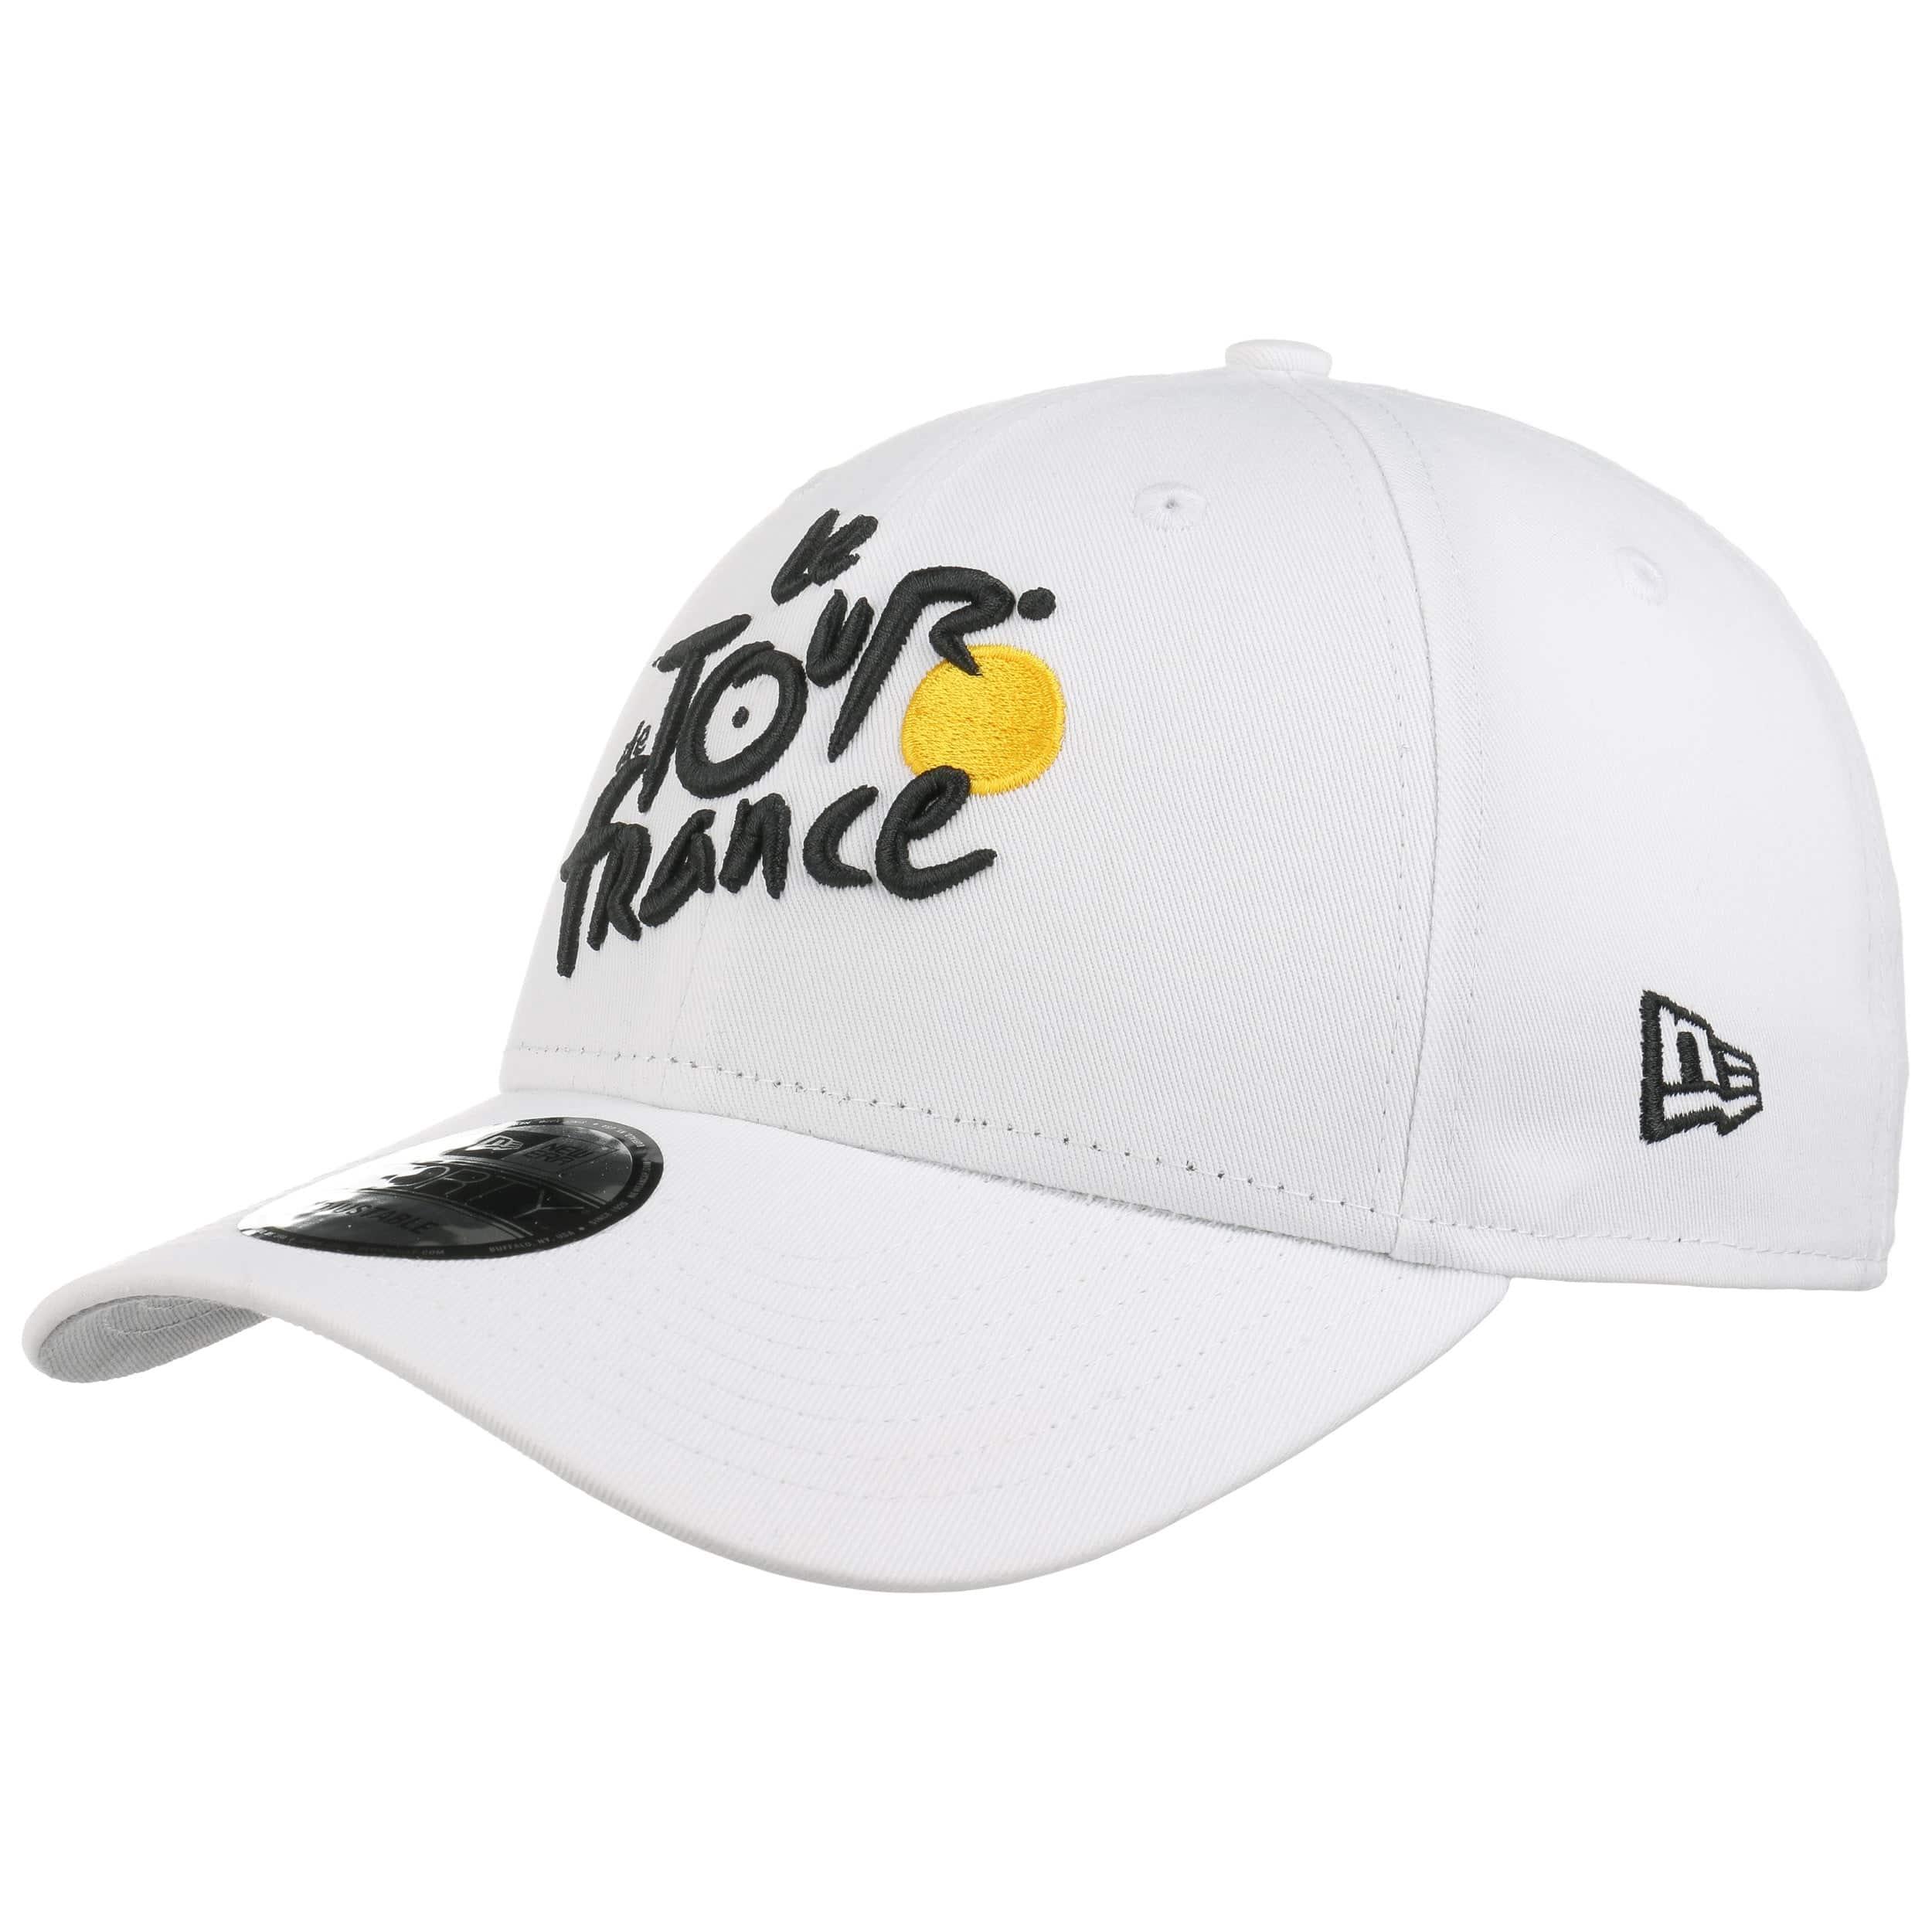 ... 9Forty JP Tour de France Cap by New Era - white 7 b342aadcb0aa